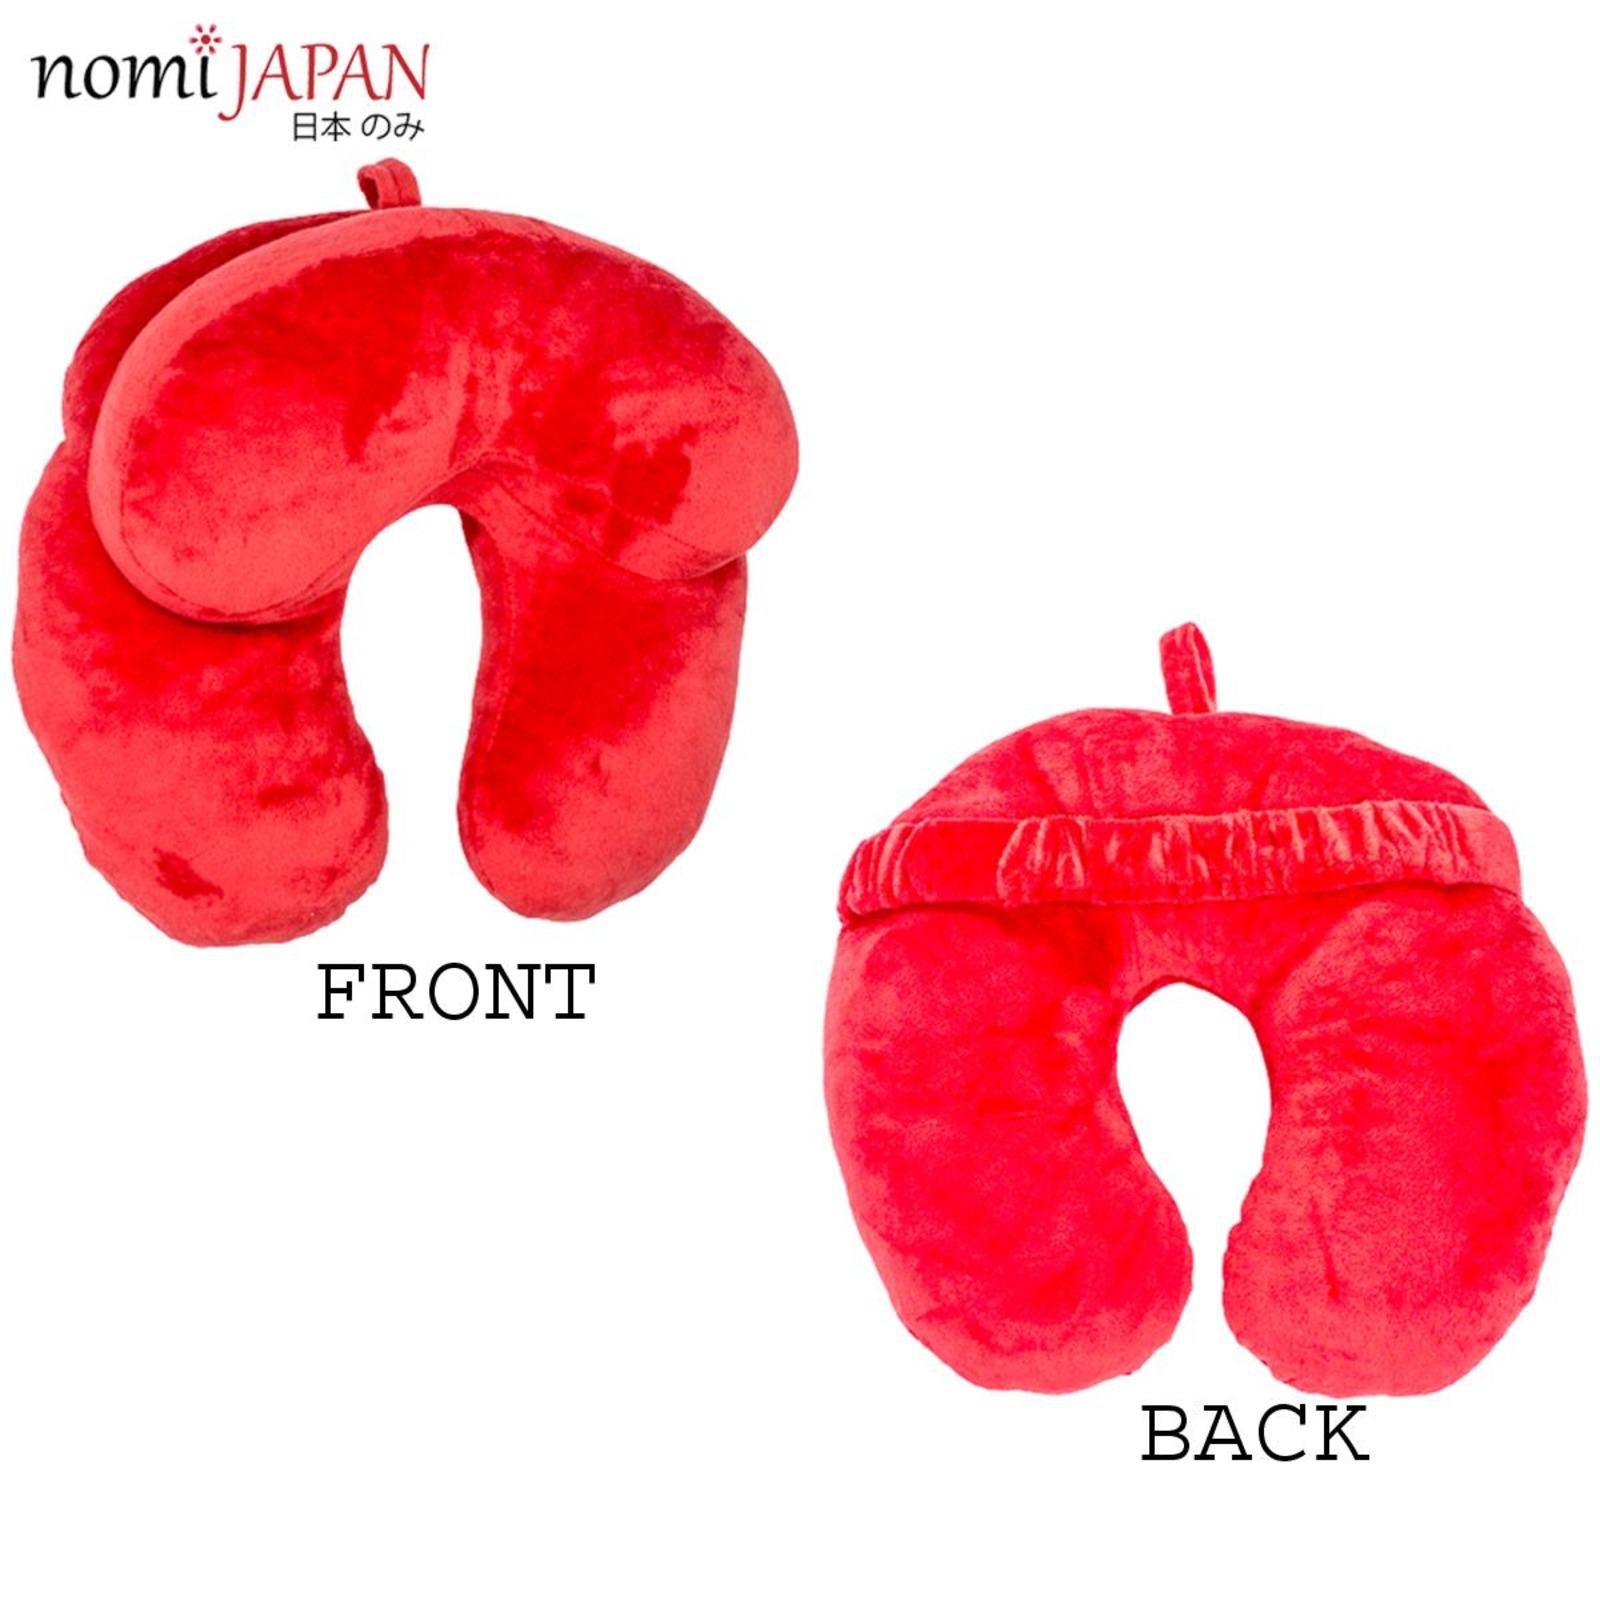 Nomi Japan Car / Neck / Utype / Travel /Cushion Pillow Maroon